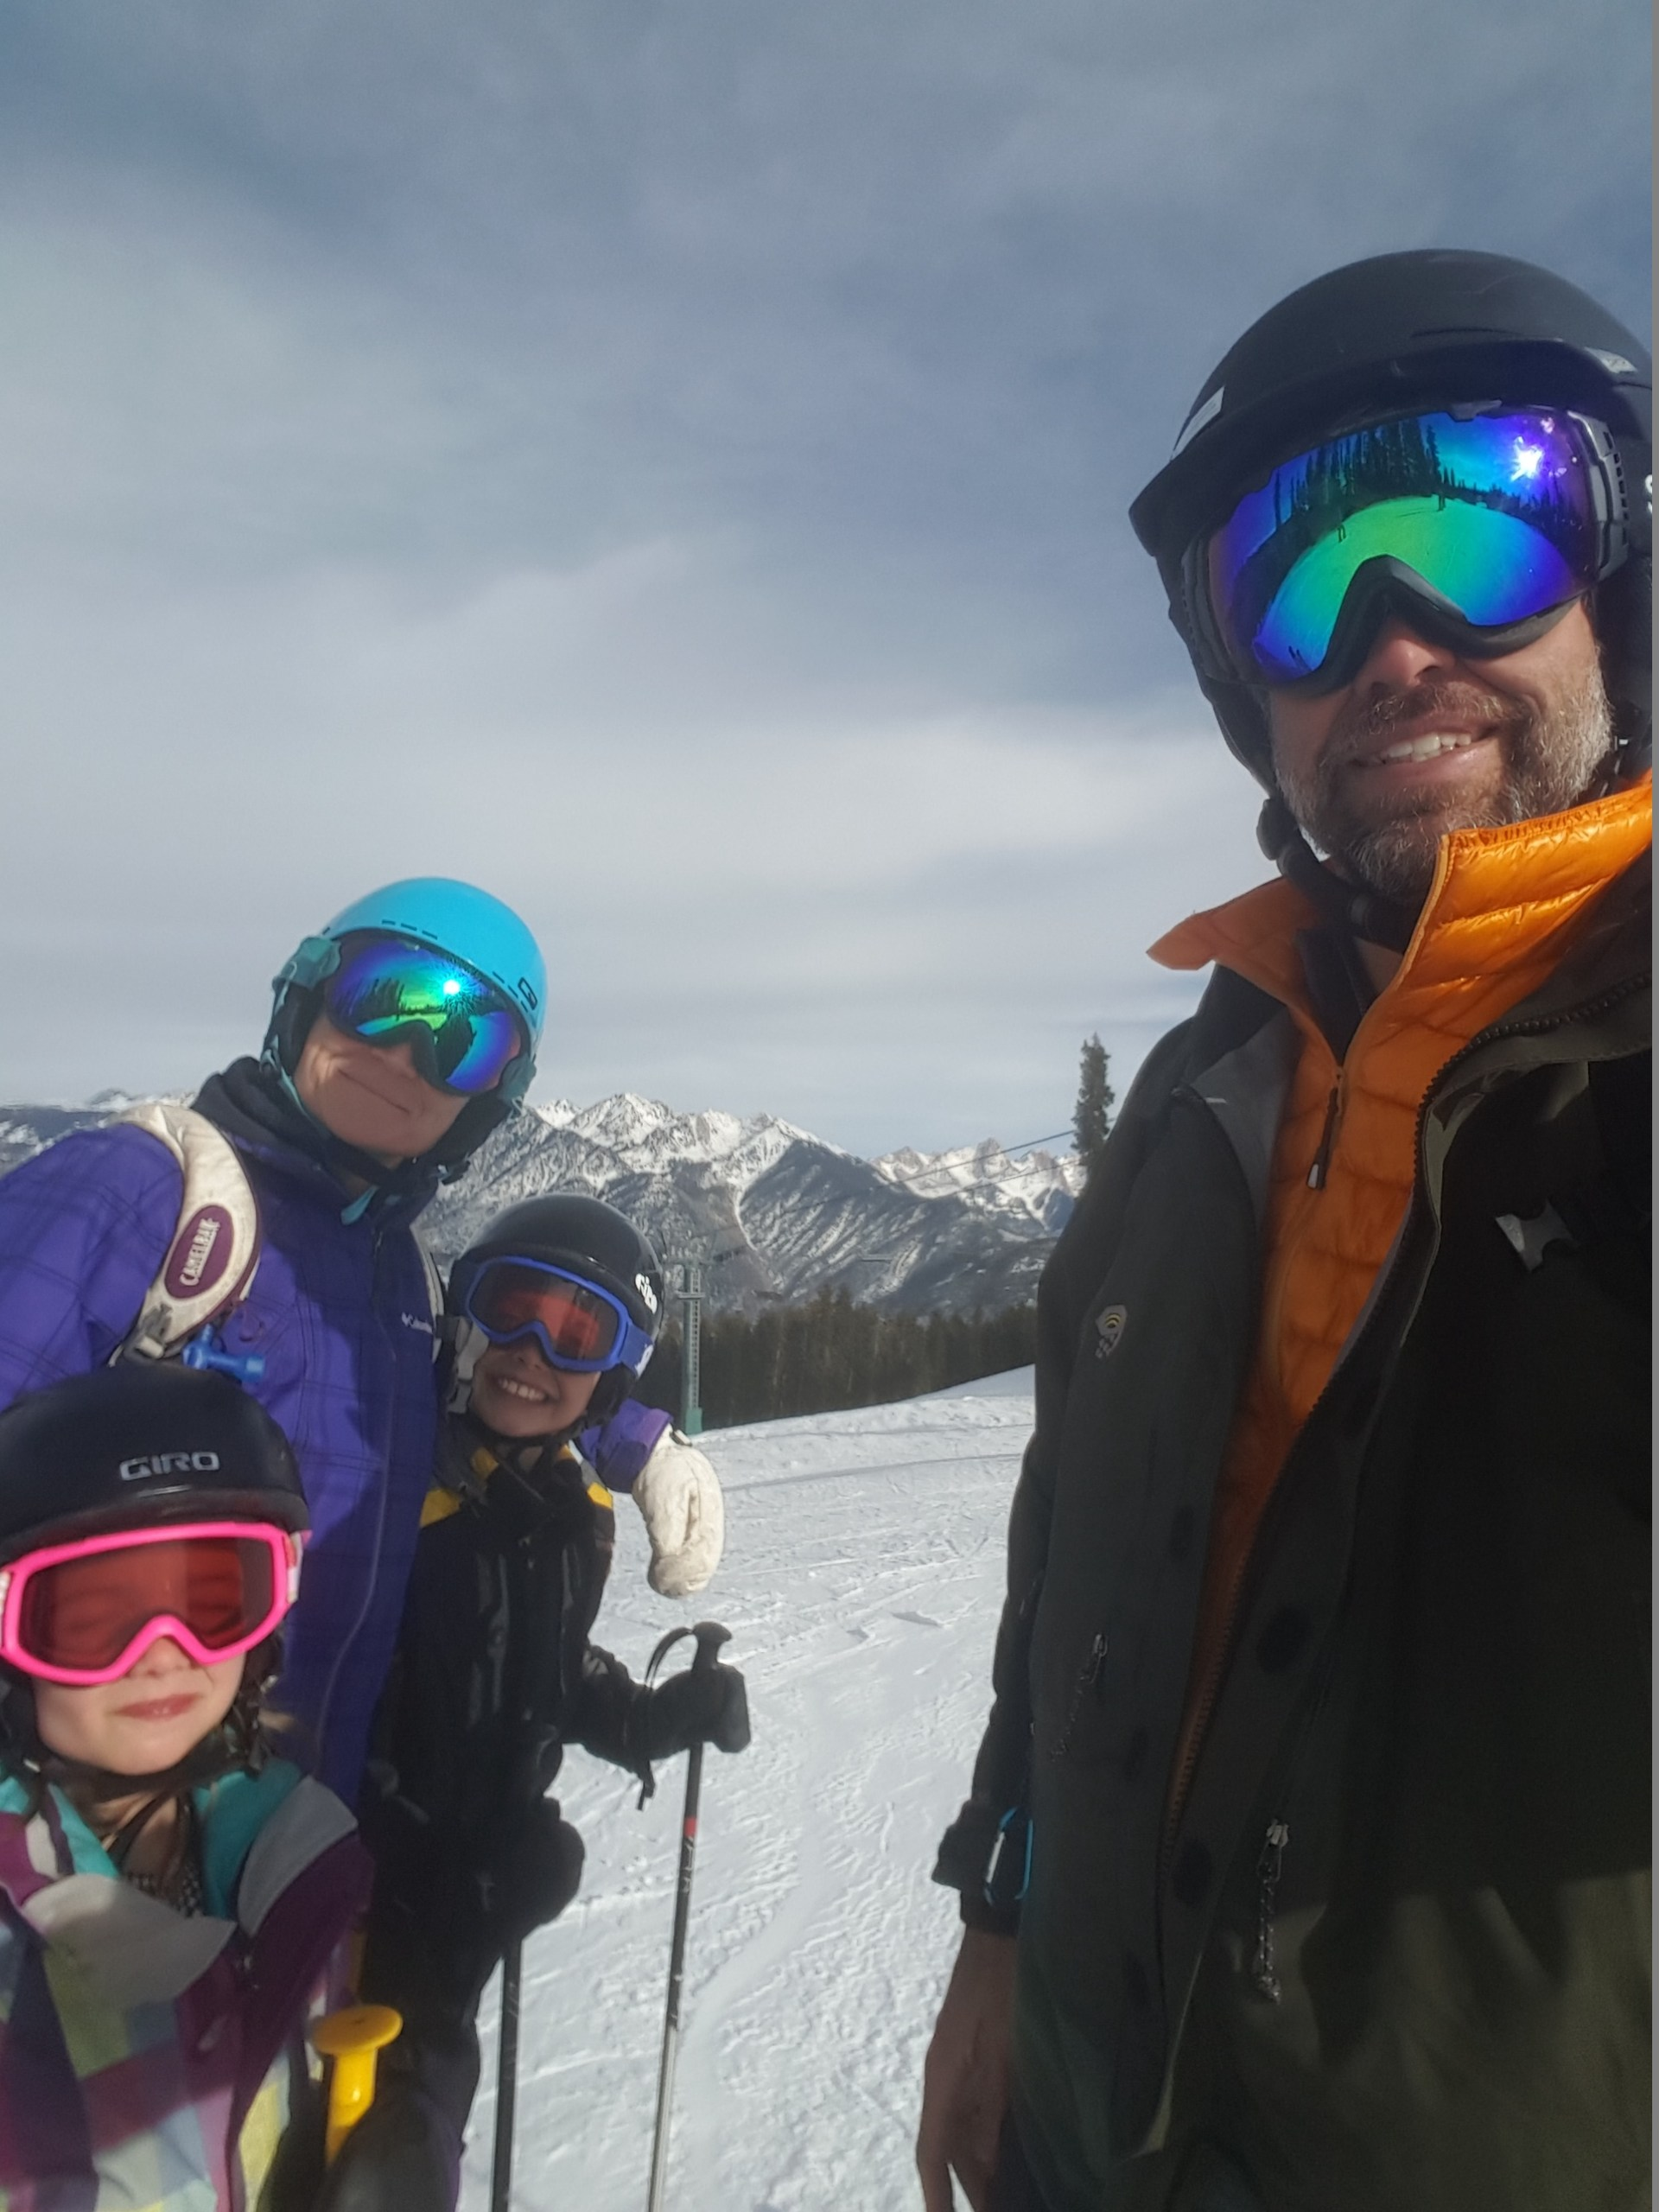 The Geygan's love skiing